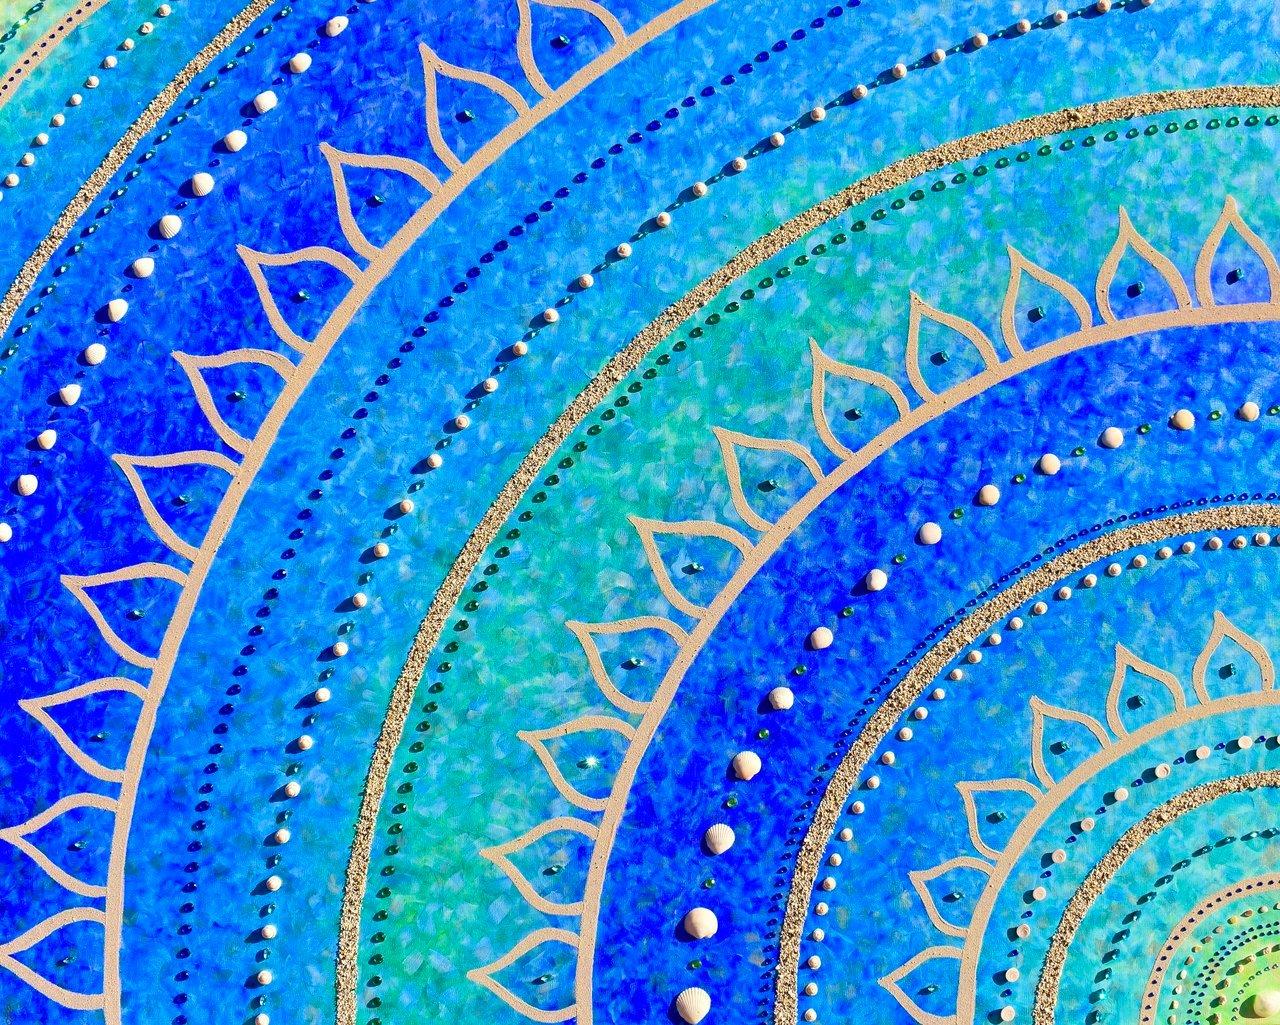 Rsz blue lotus unkdwt